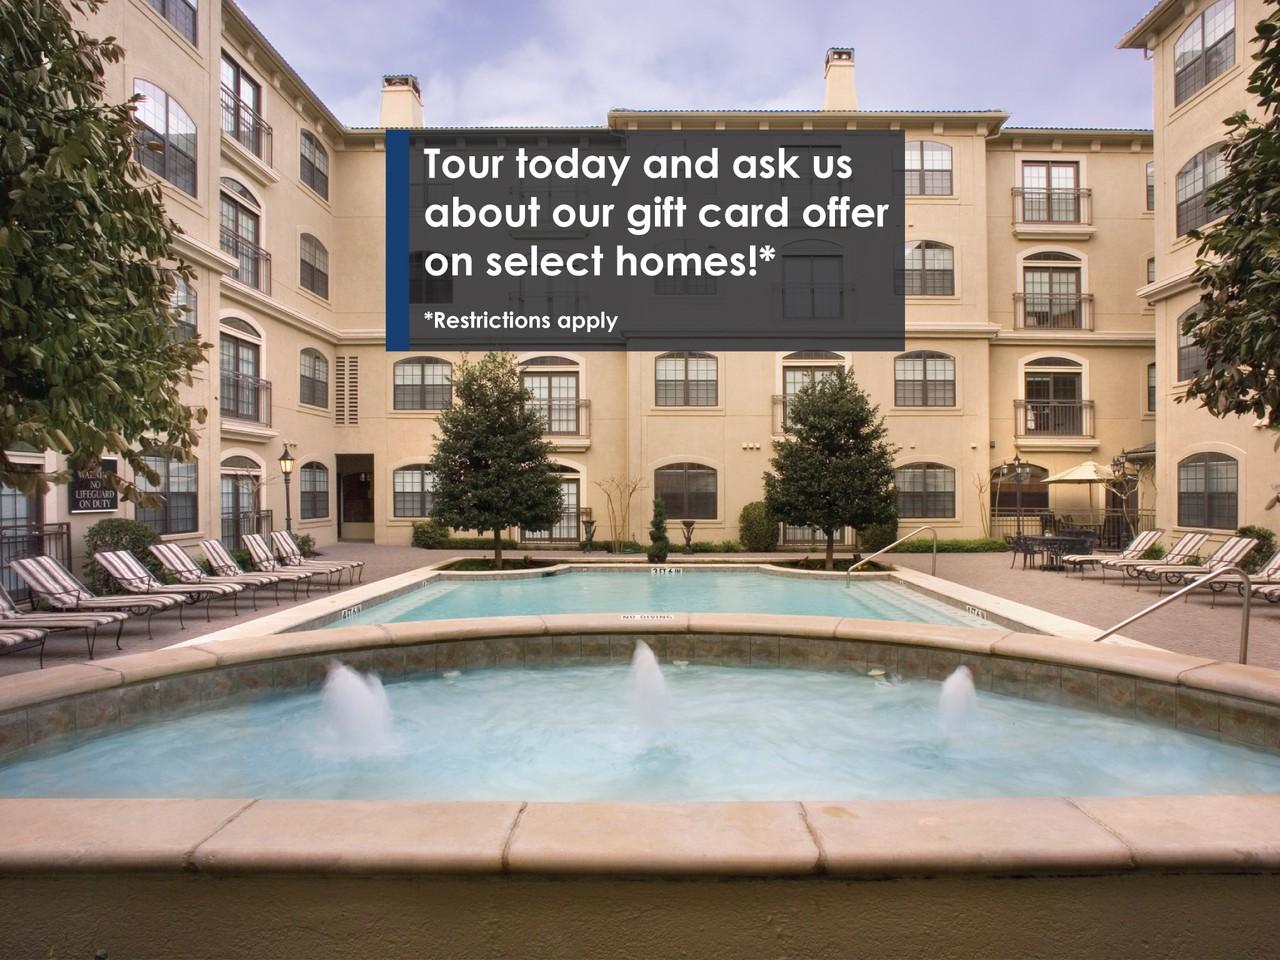 Gables Mirabella - 2600 Cole Ave, Dallas, TX 75204 - Apartment for ...